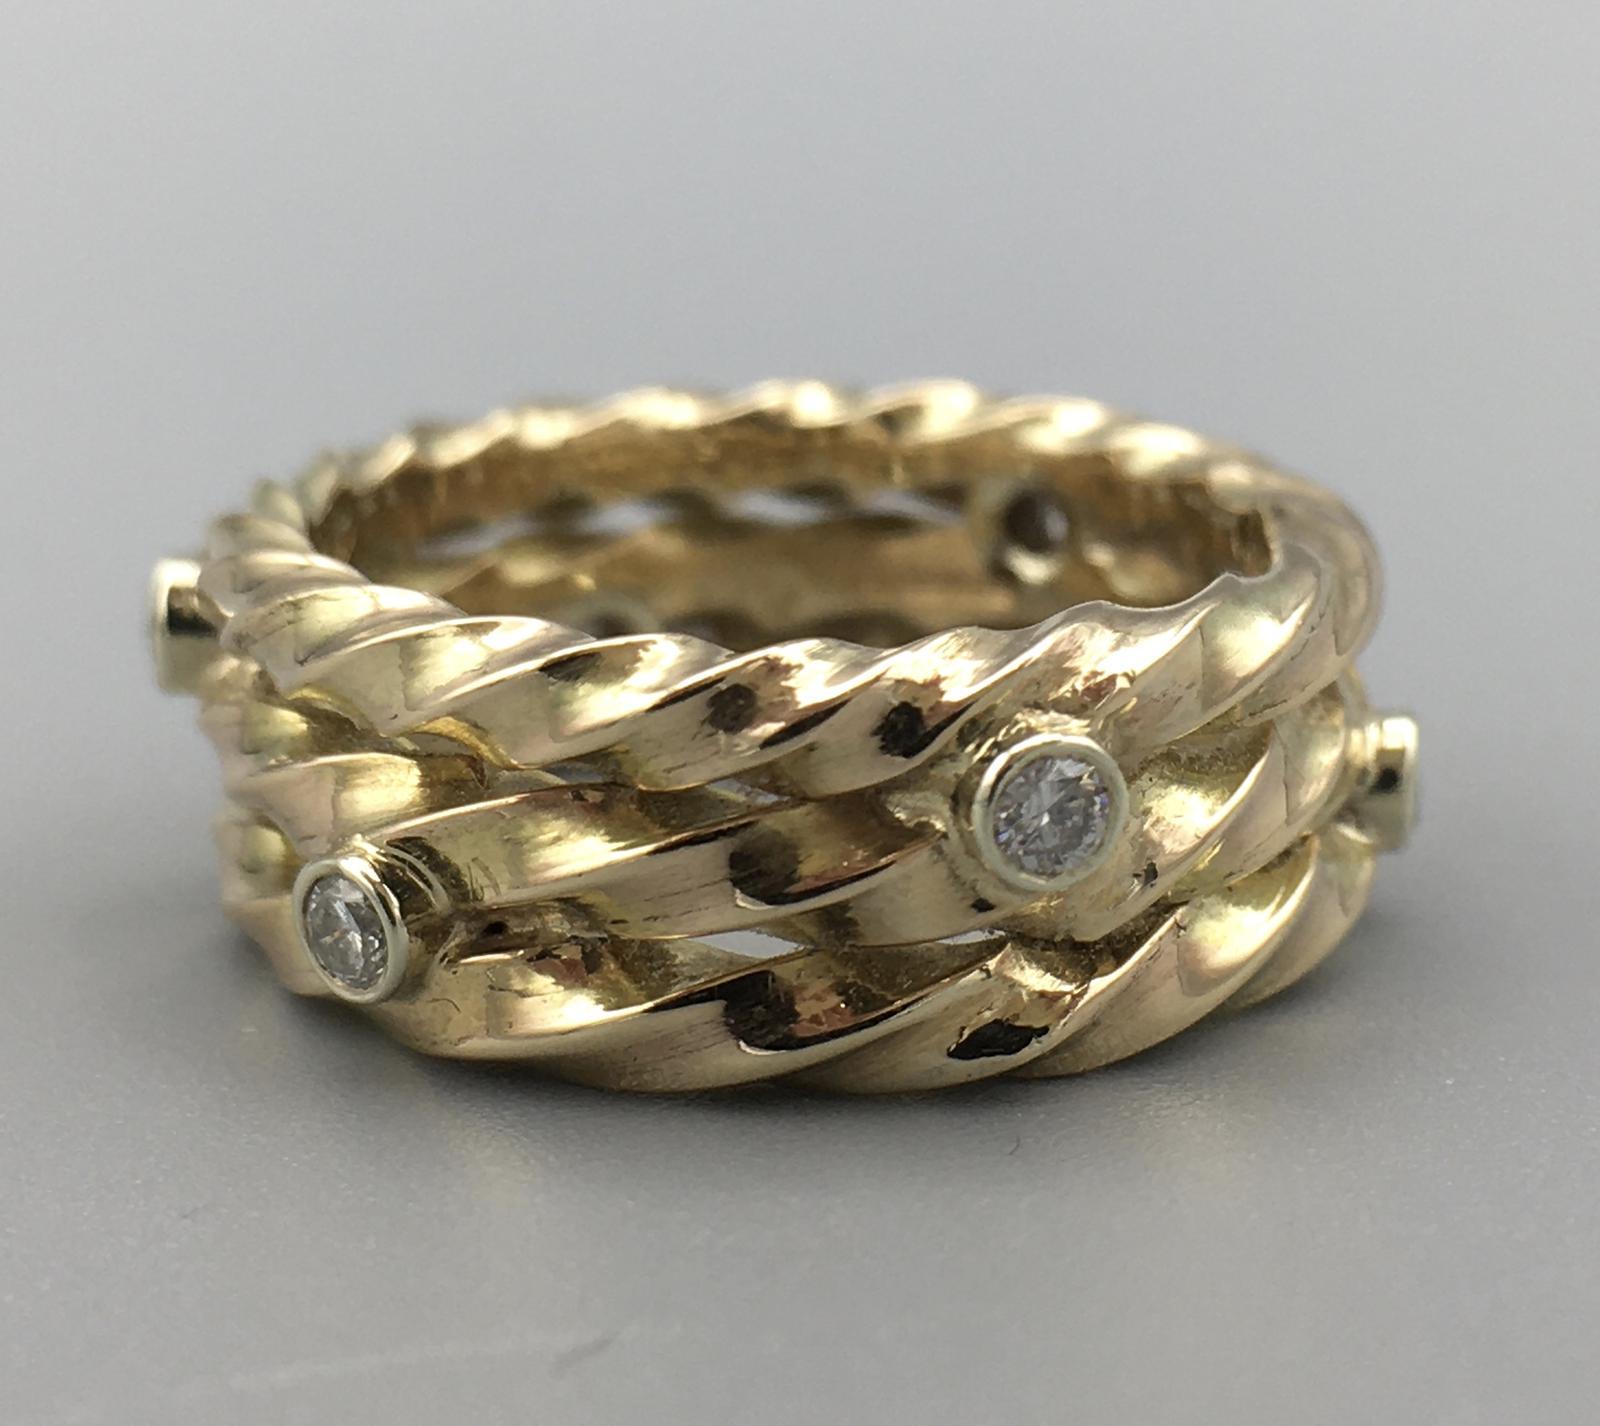 Teresa Brill Jewellery Ltd image (3 of 4)